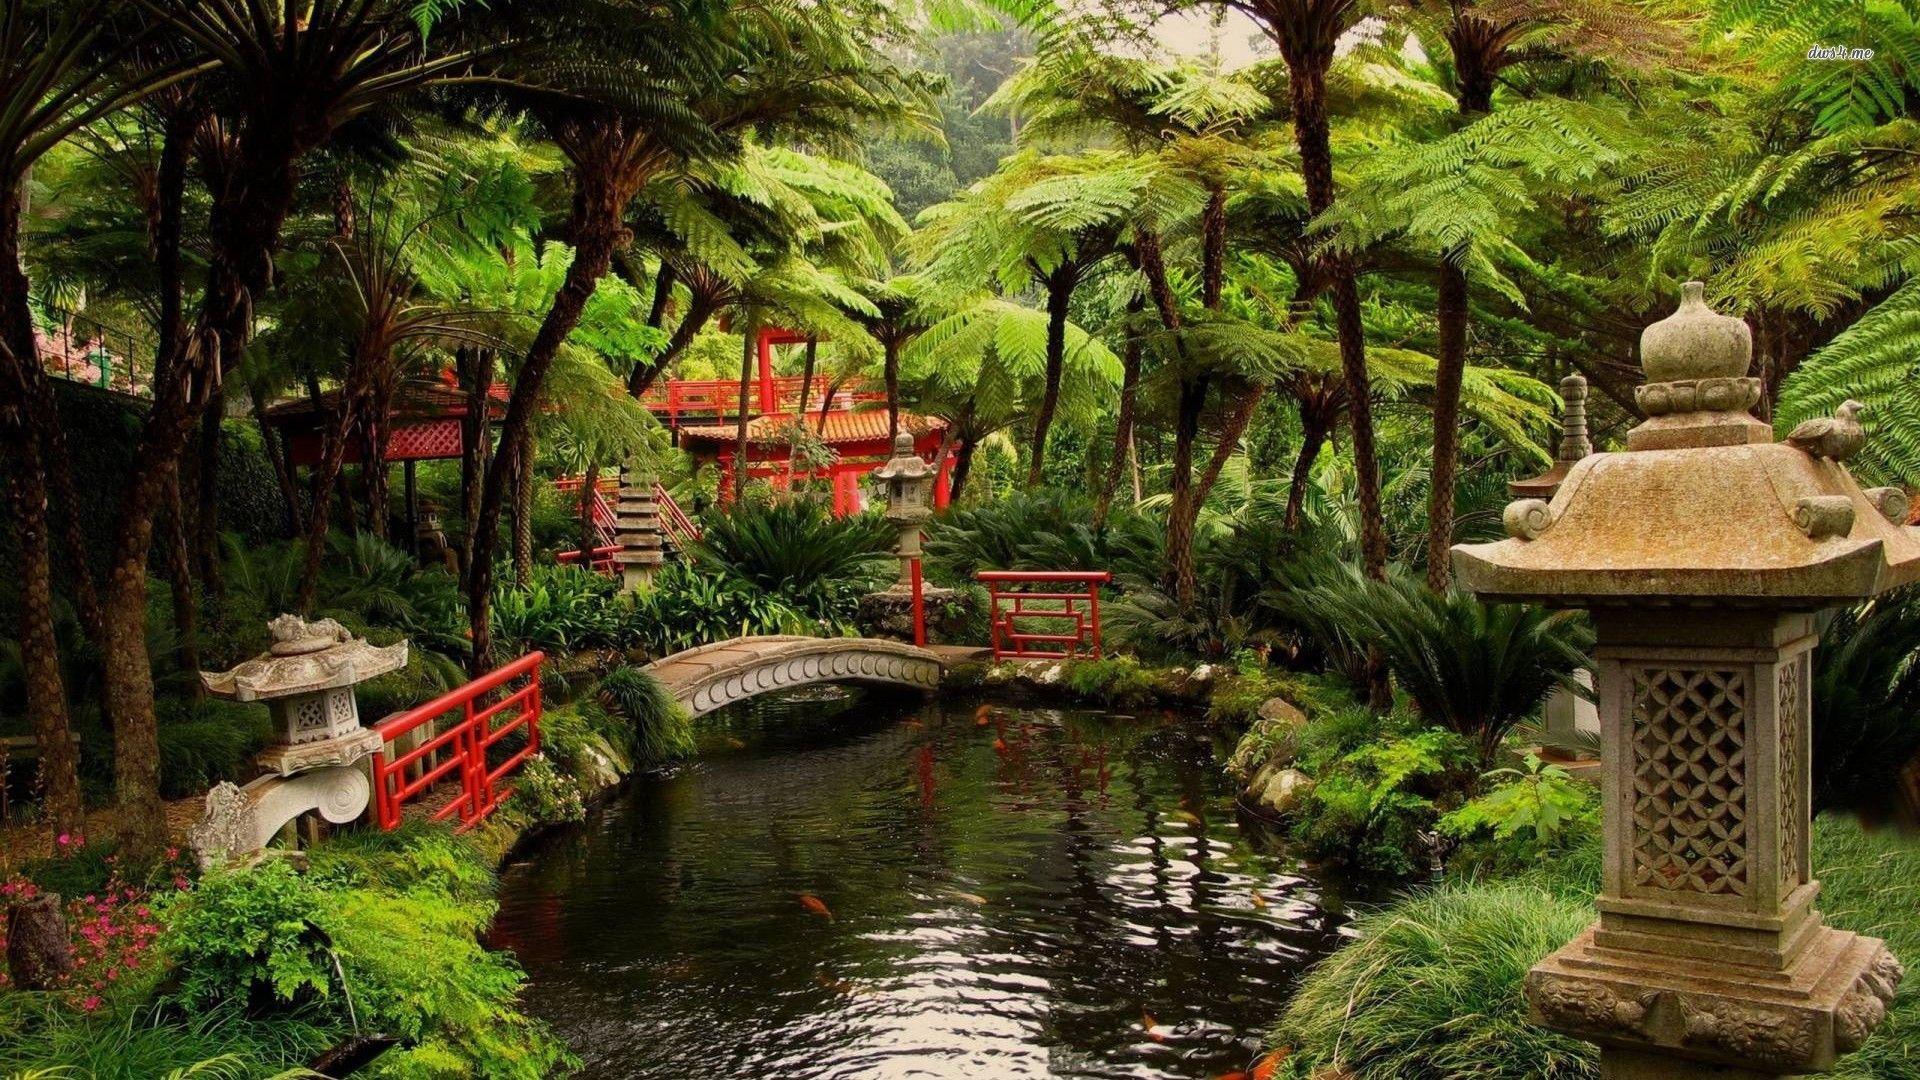 Other Japanese Garden Bridge Pond Building Trees World Wallpaper